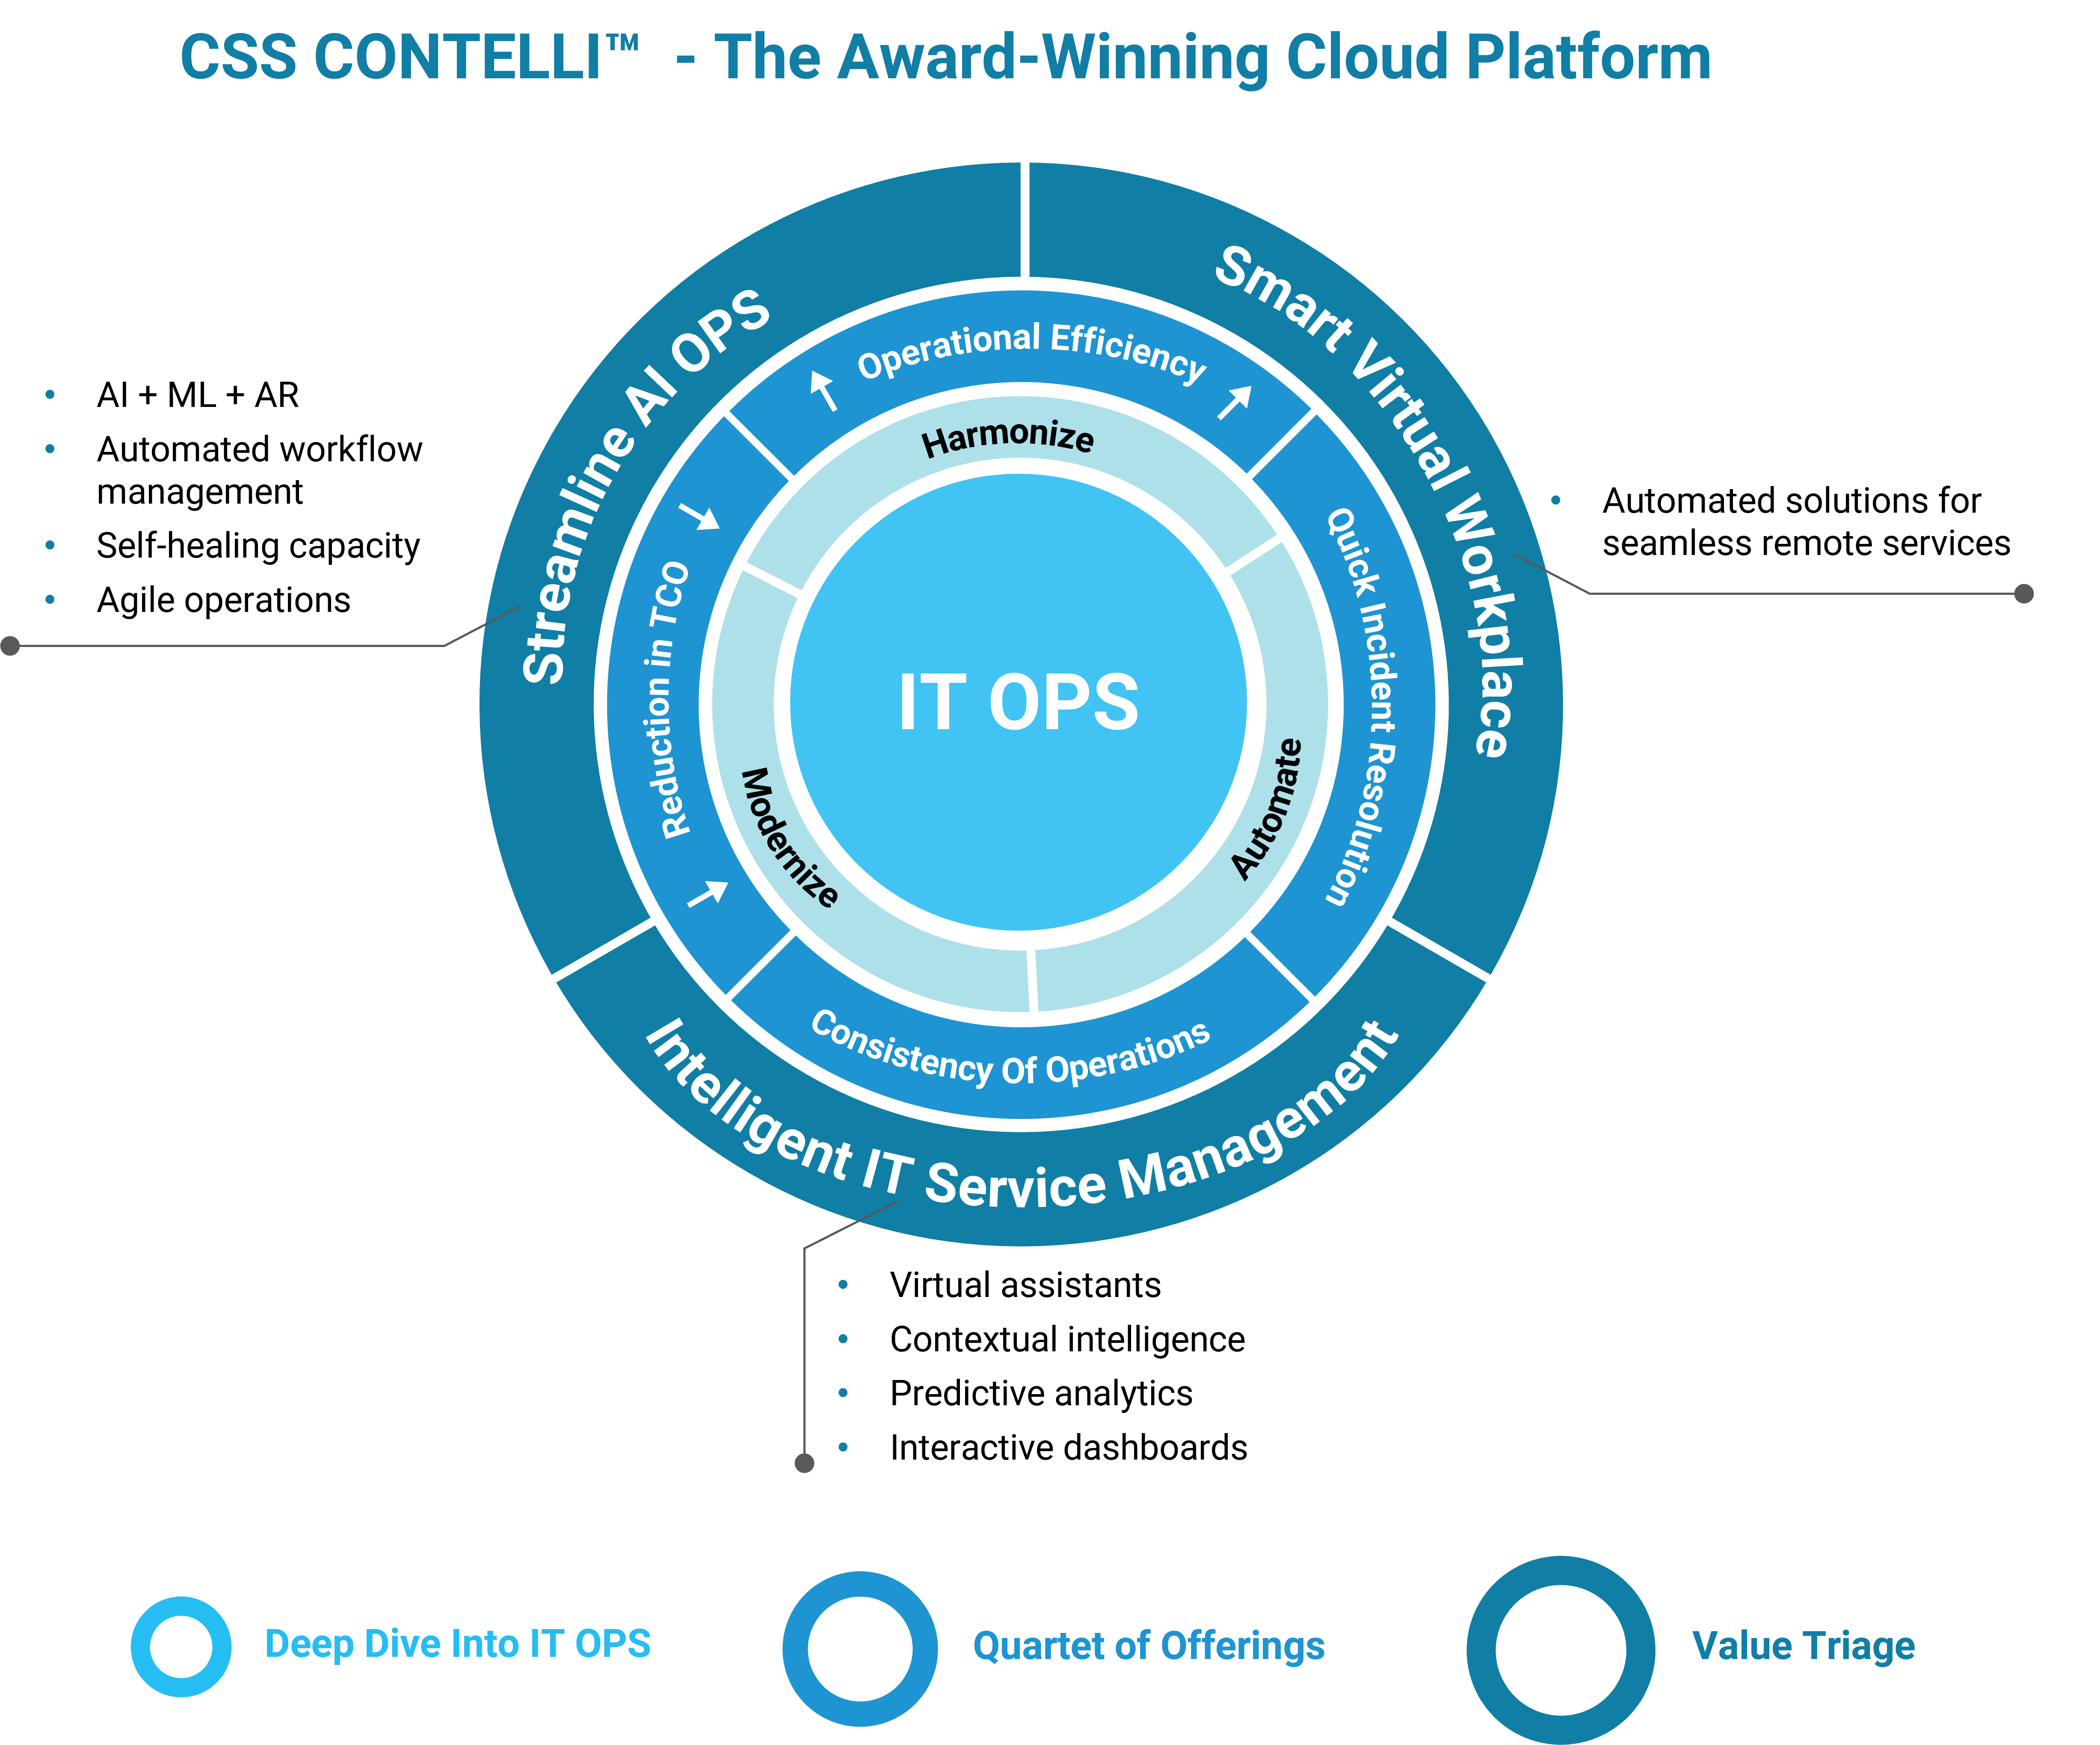 Award-winning cloud platform